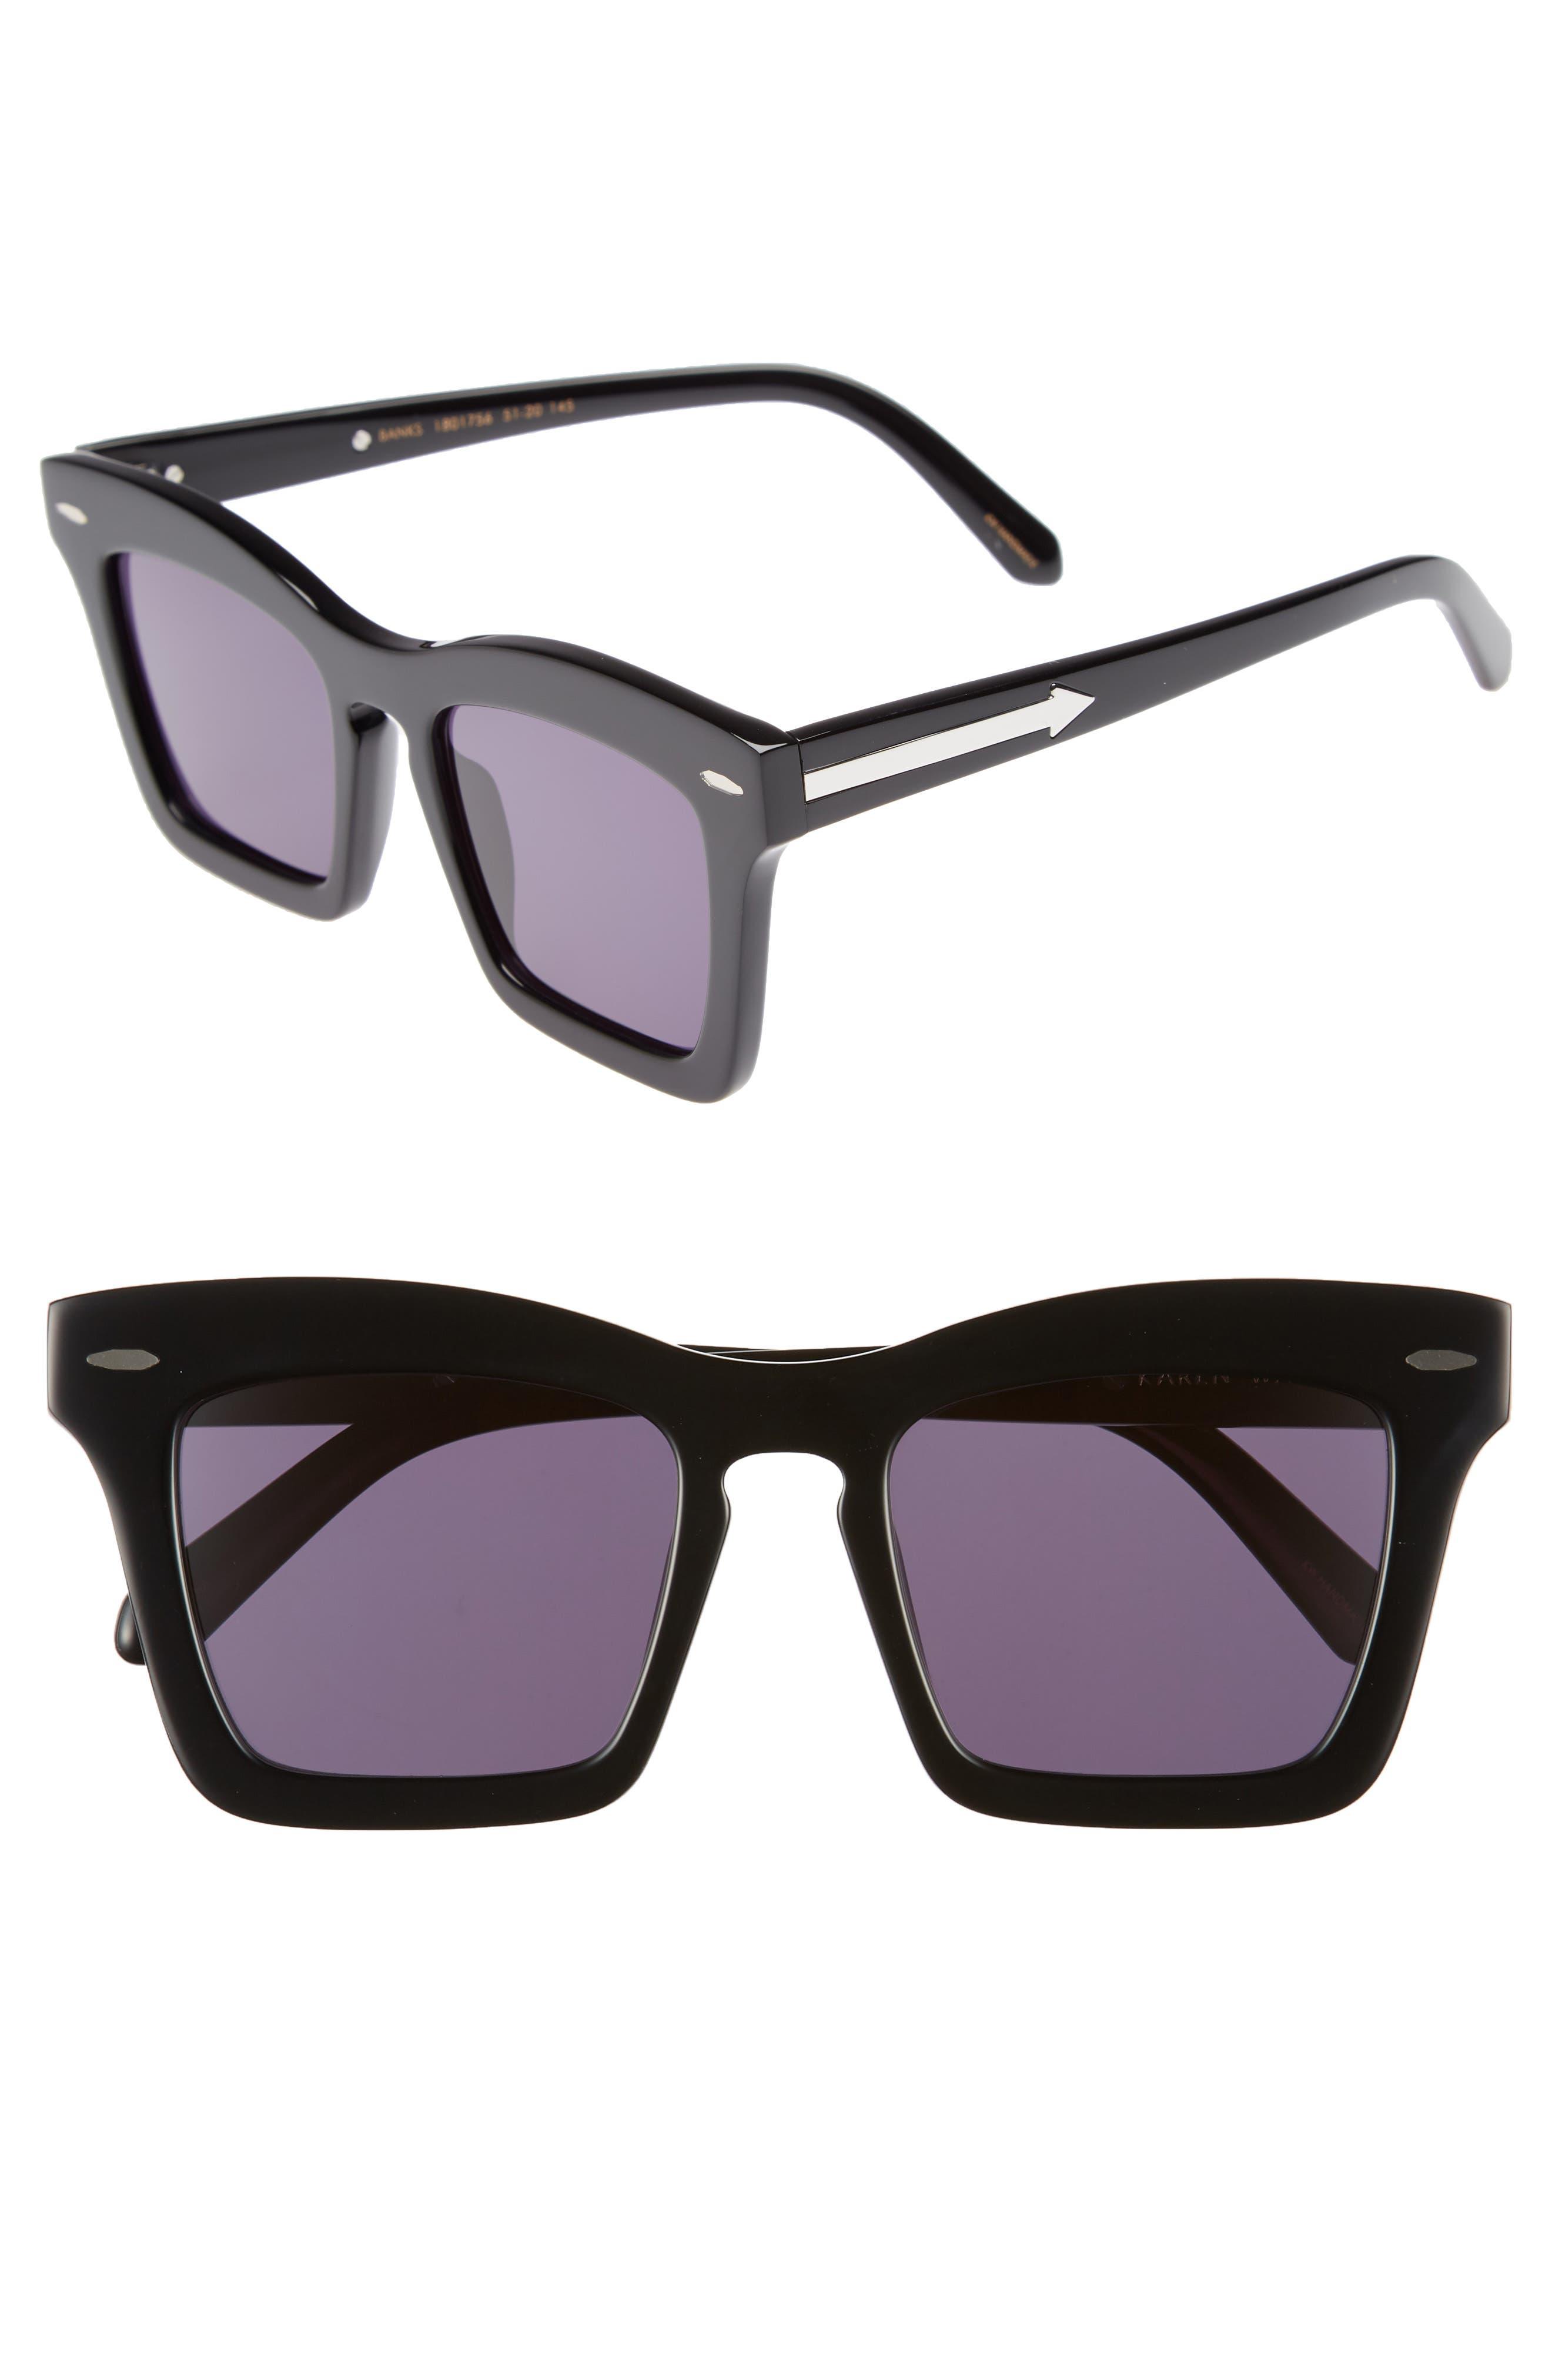 Banks 51mm Rectangular Sunglasses,                             Main thumbnail 1, color,                             BLACK